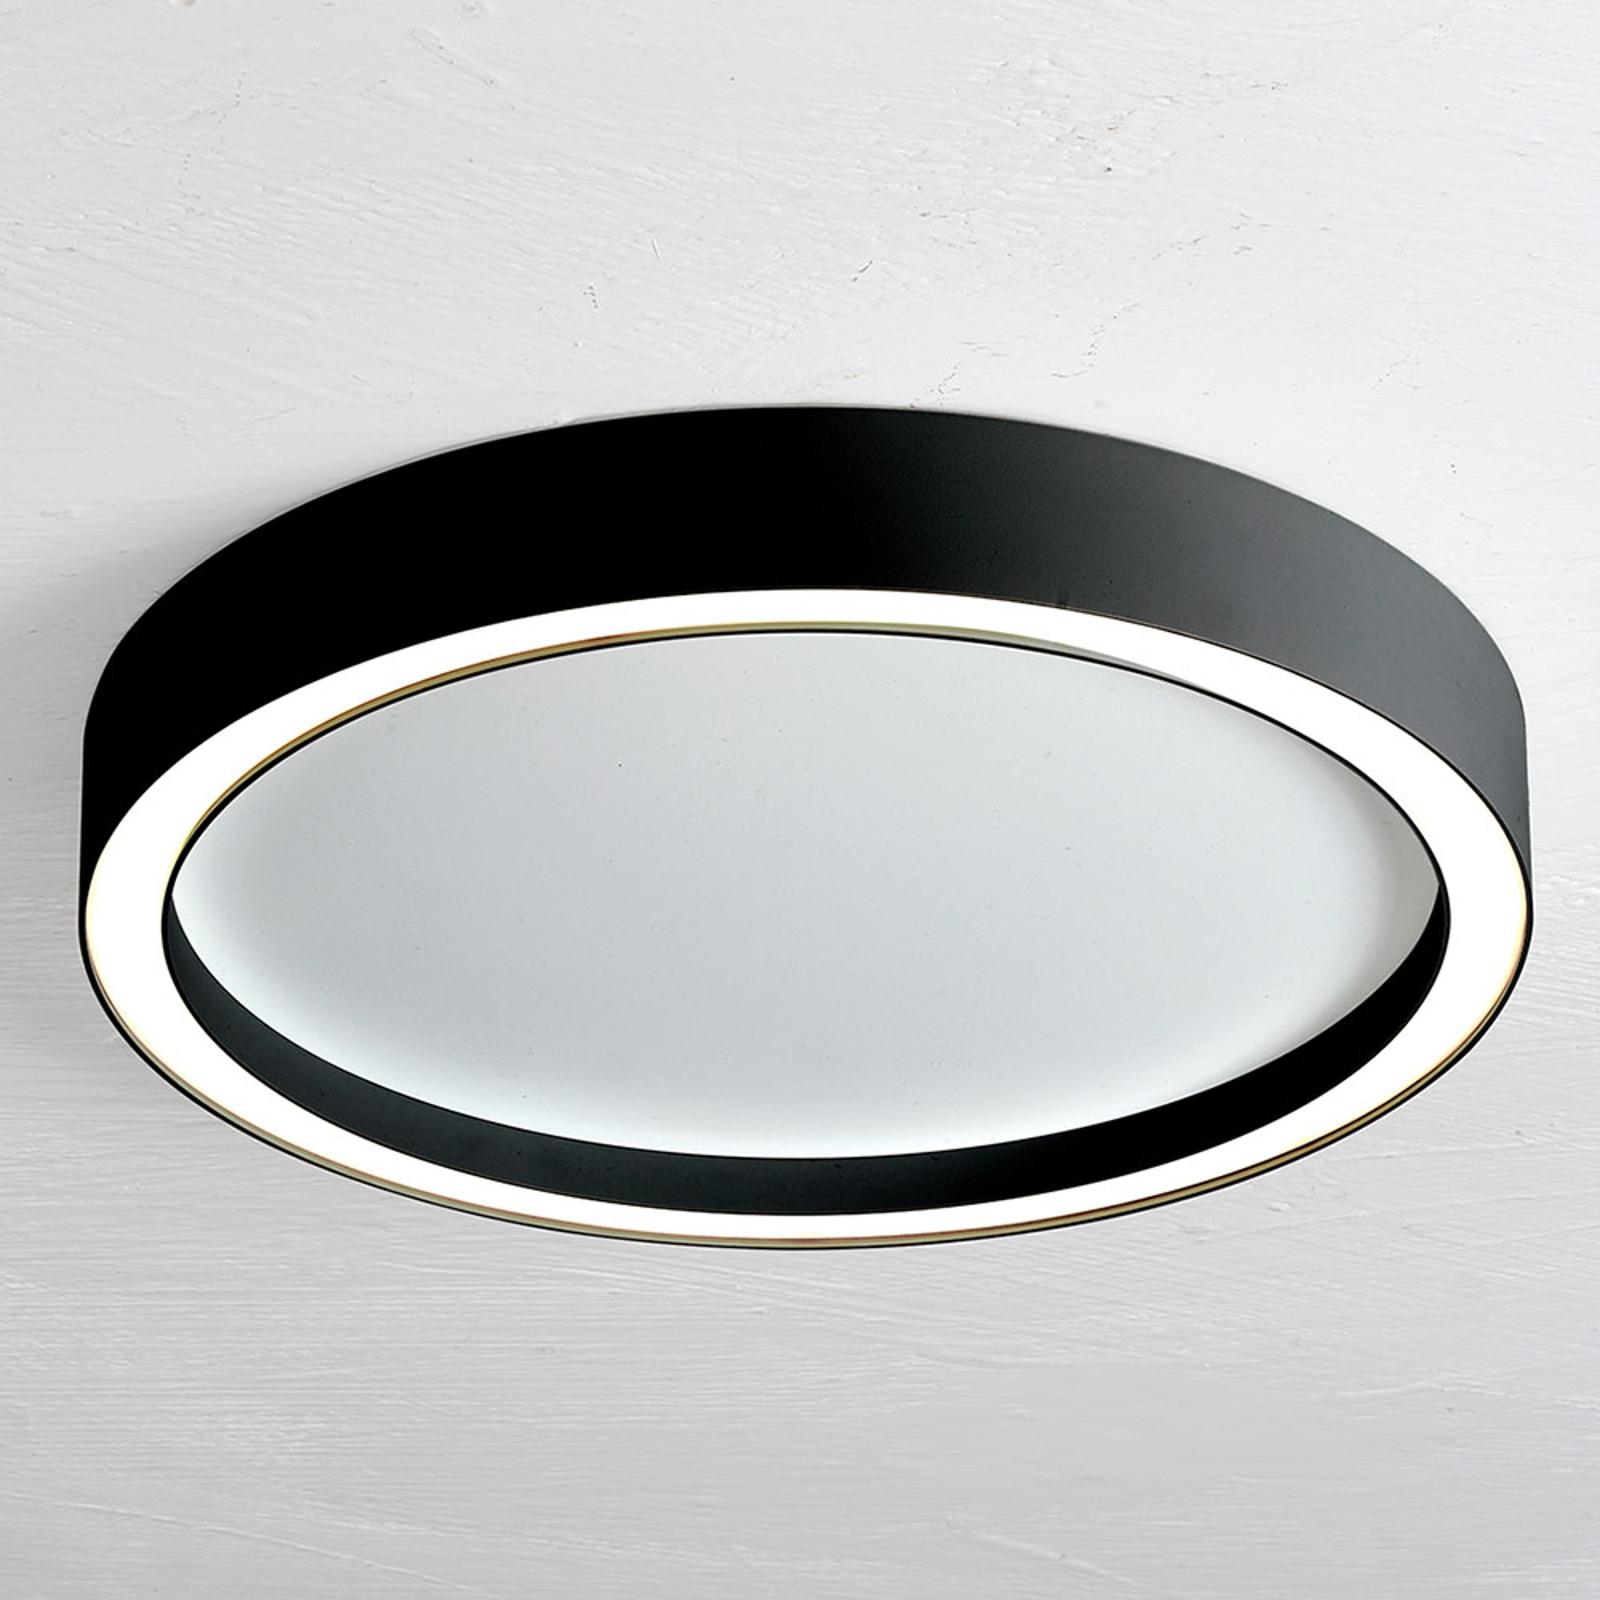 Bopp Aura LED-loftlampe, Ø 55 cm, hvid, sort